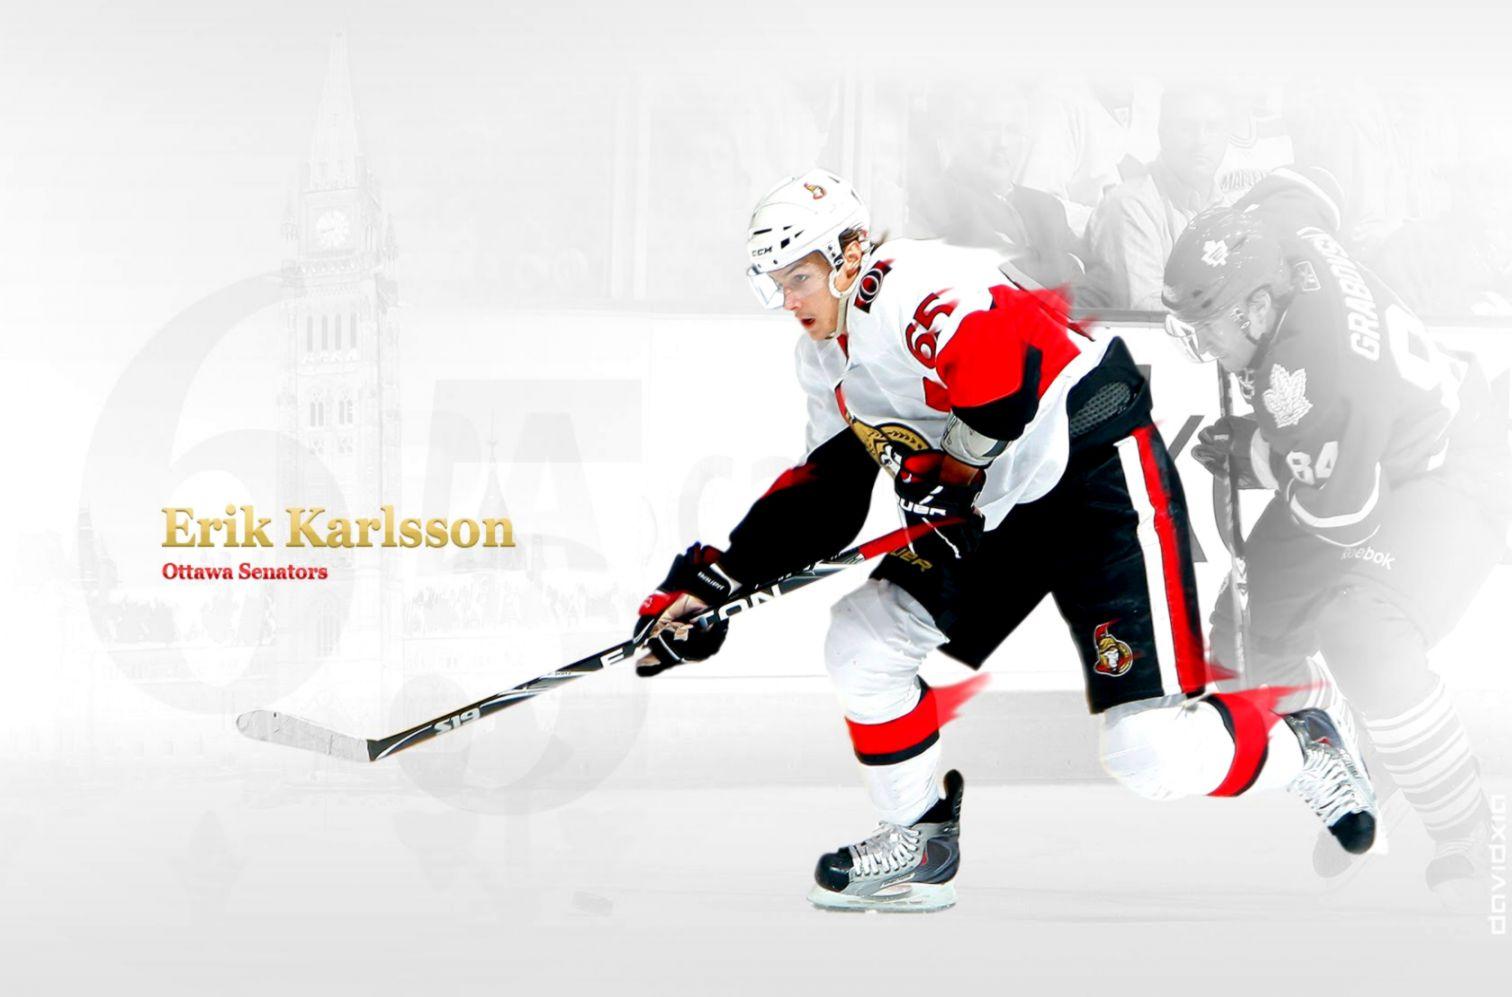 Erik Karlsson Ottawa Senators Hd Desktop Joss Wallpapers 1512x997